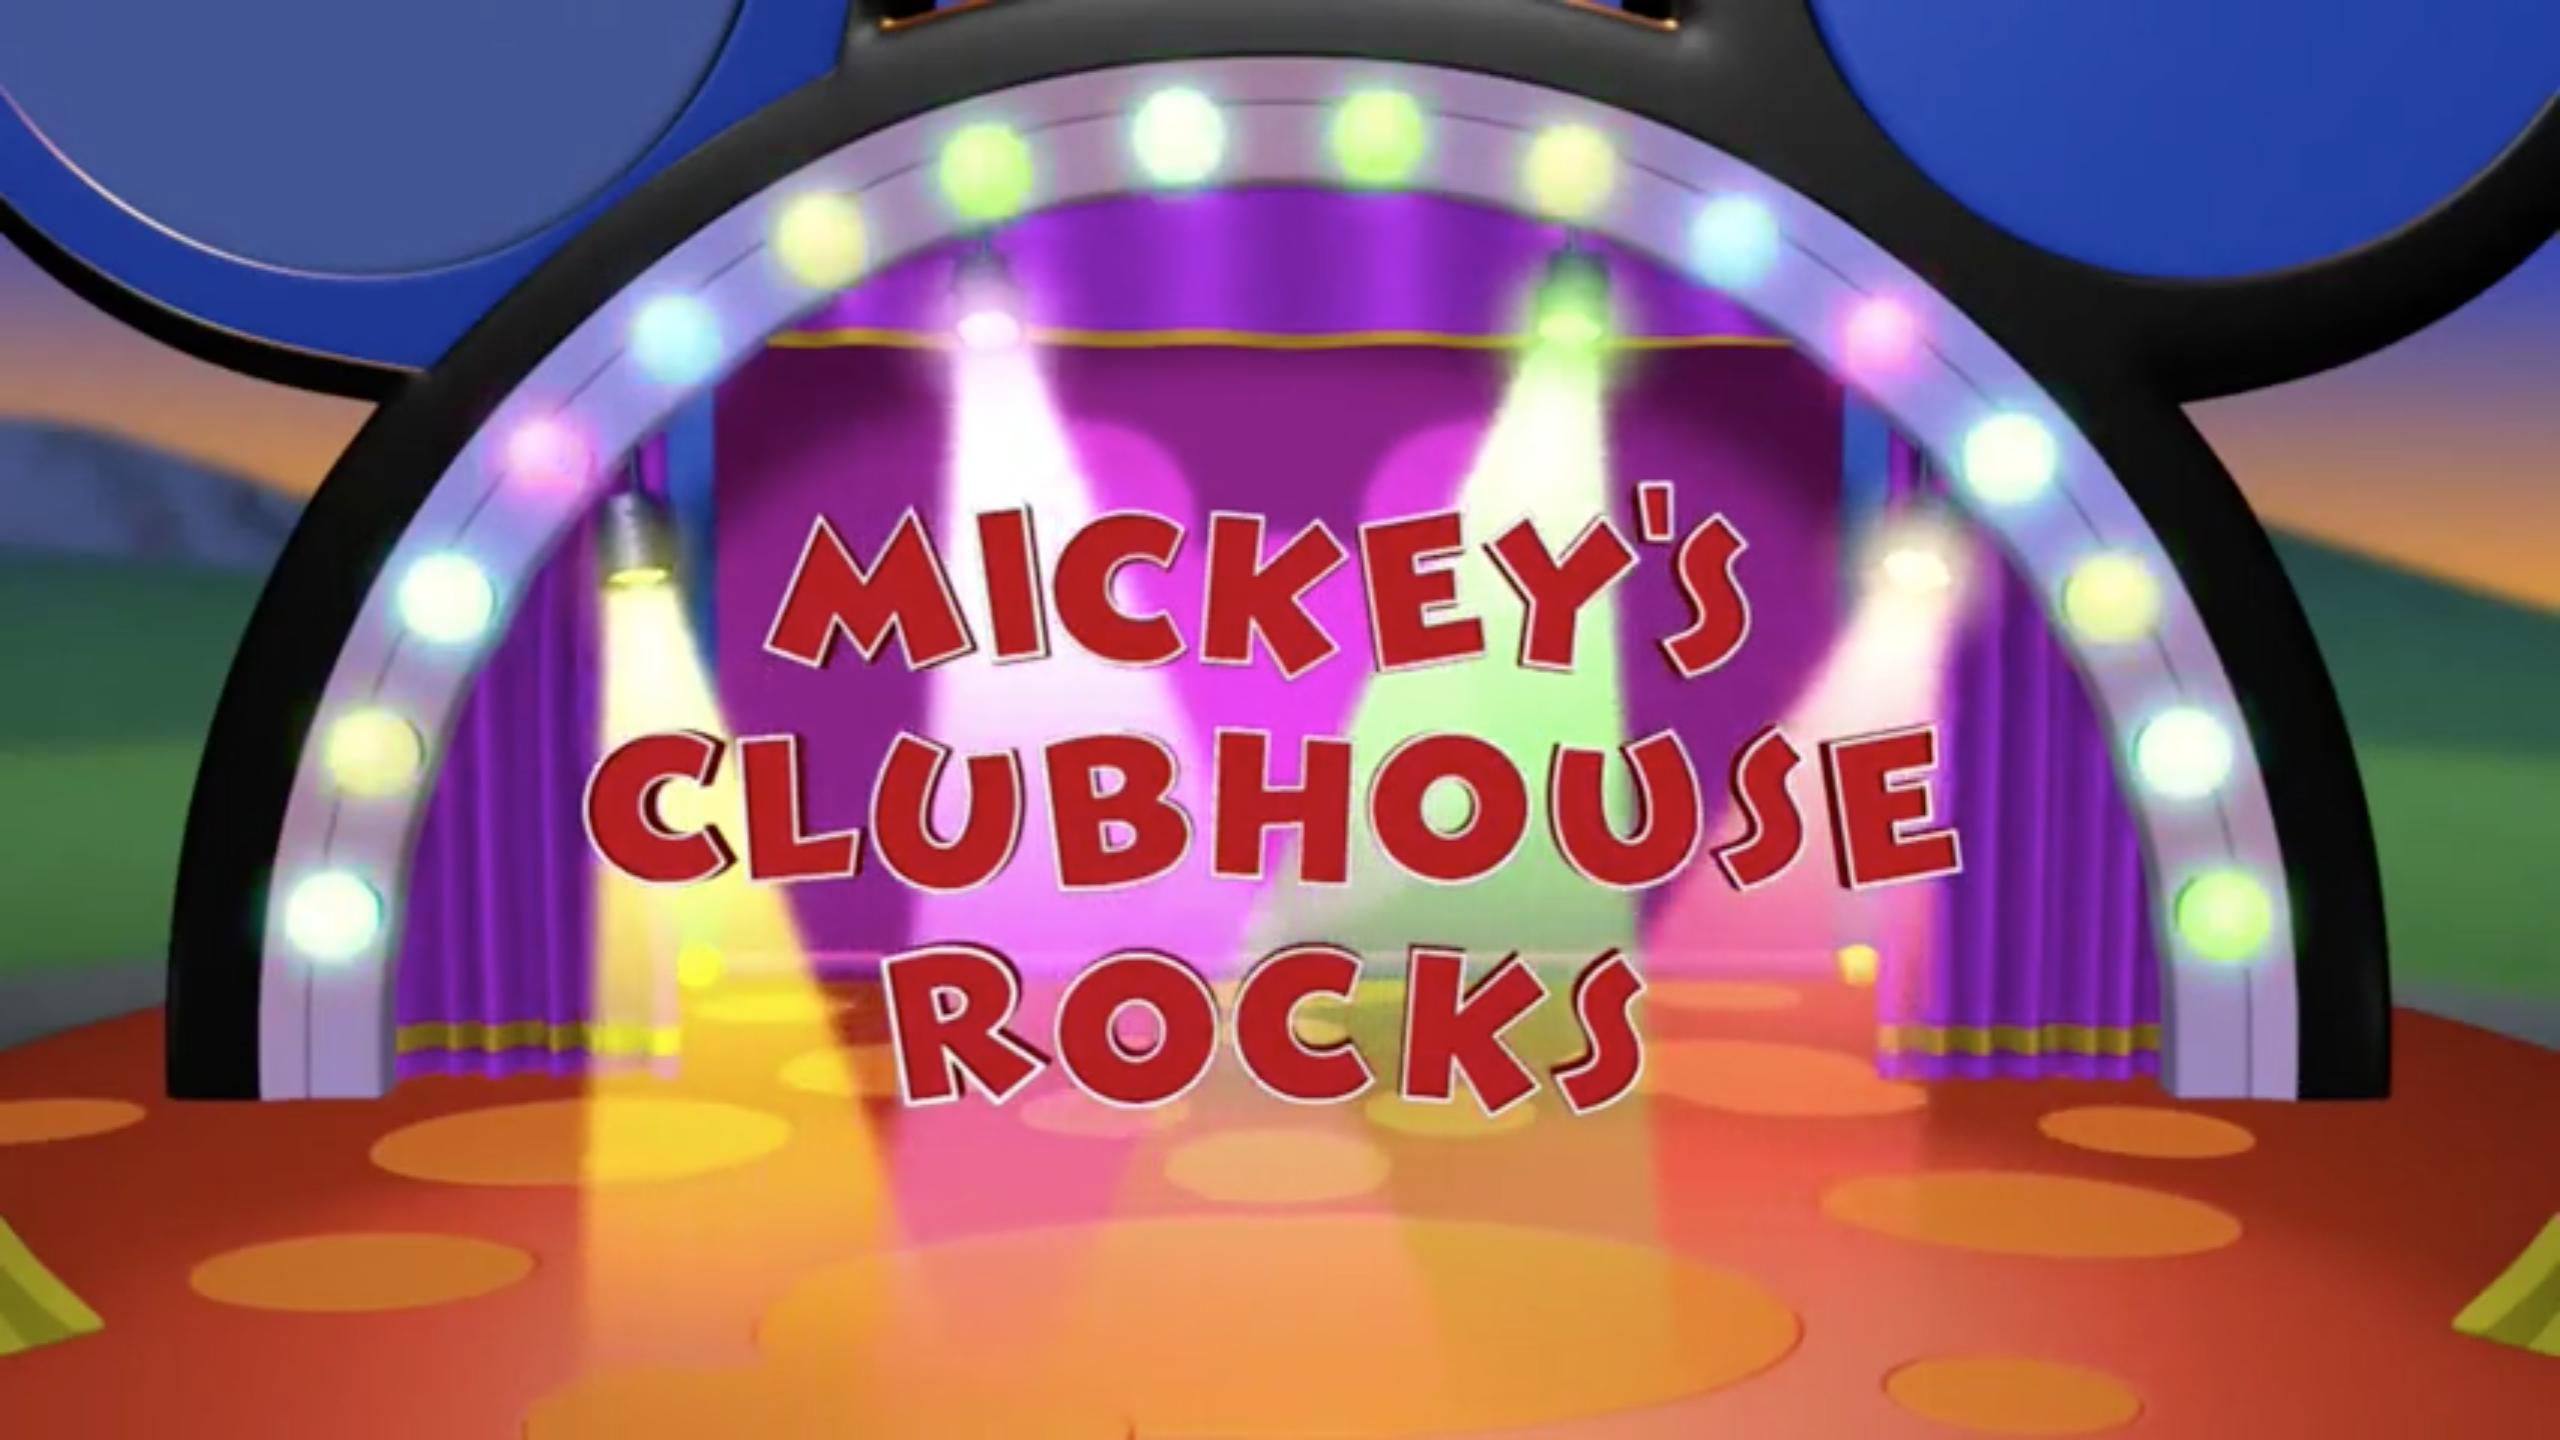 Mickey's Clubhouse Rocks